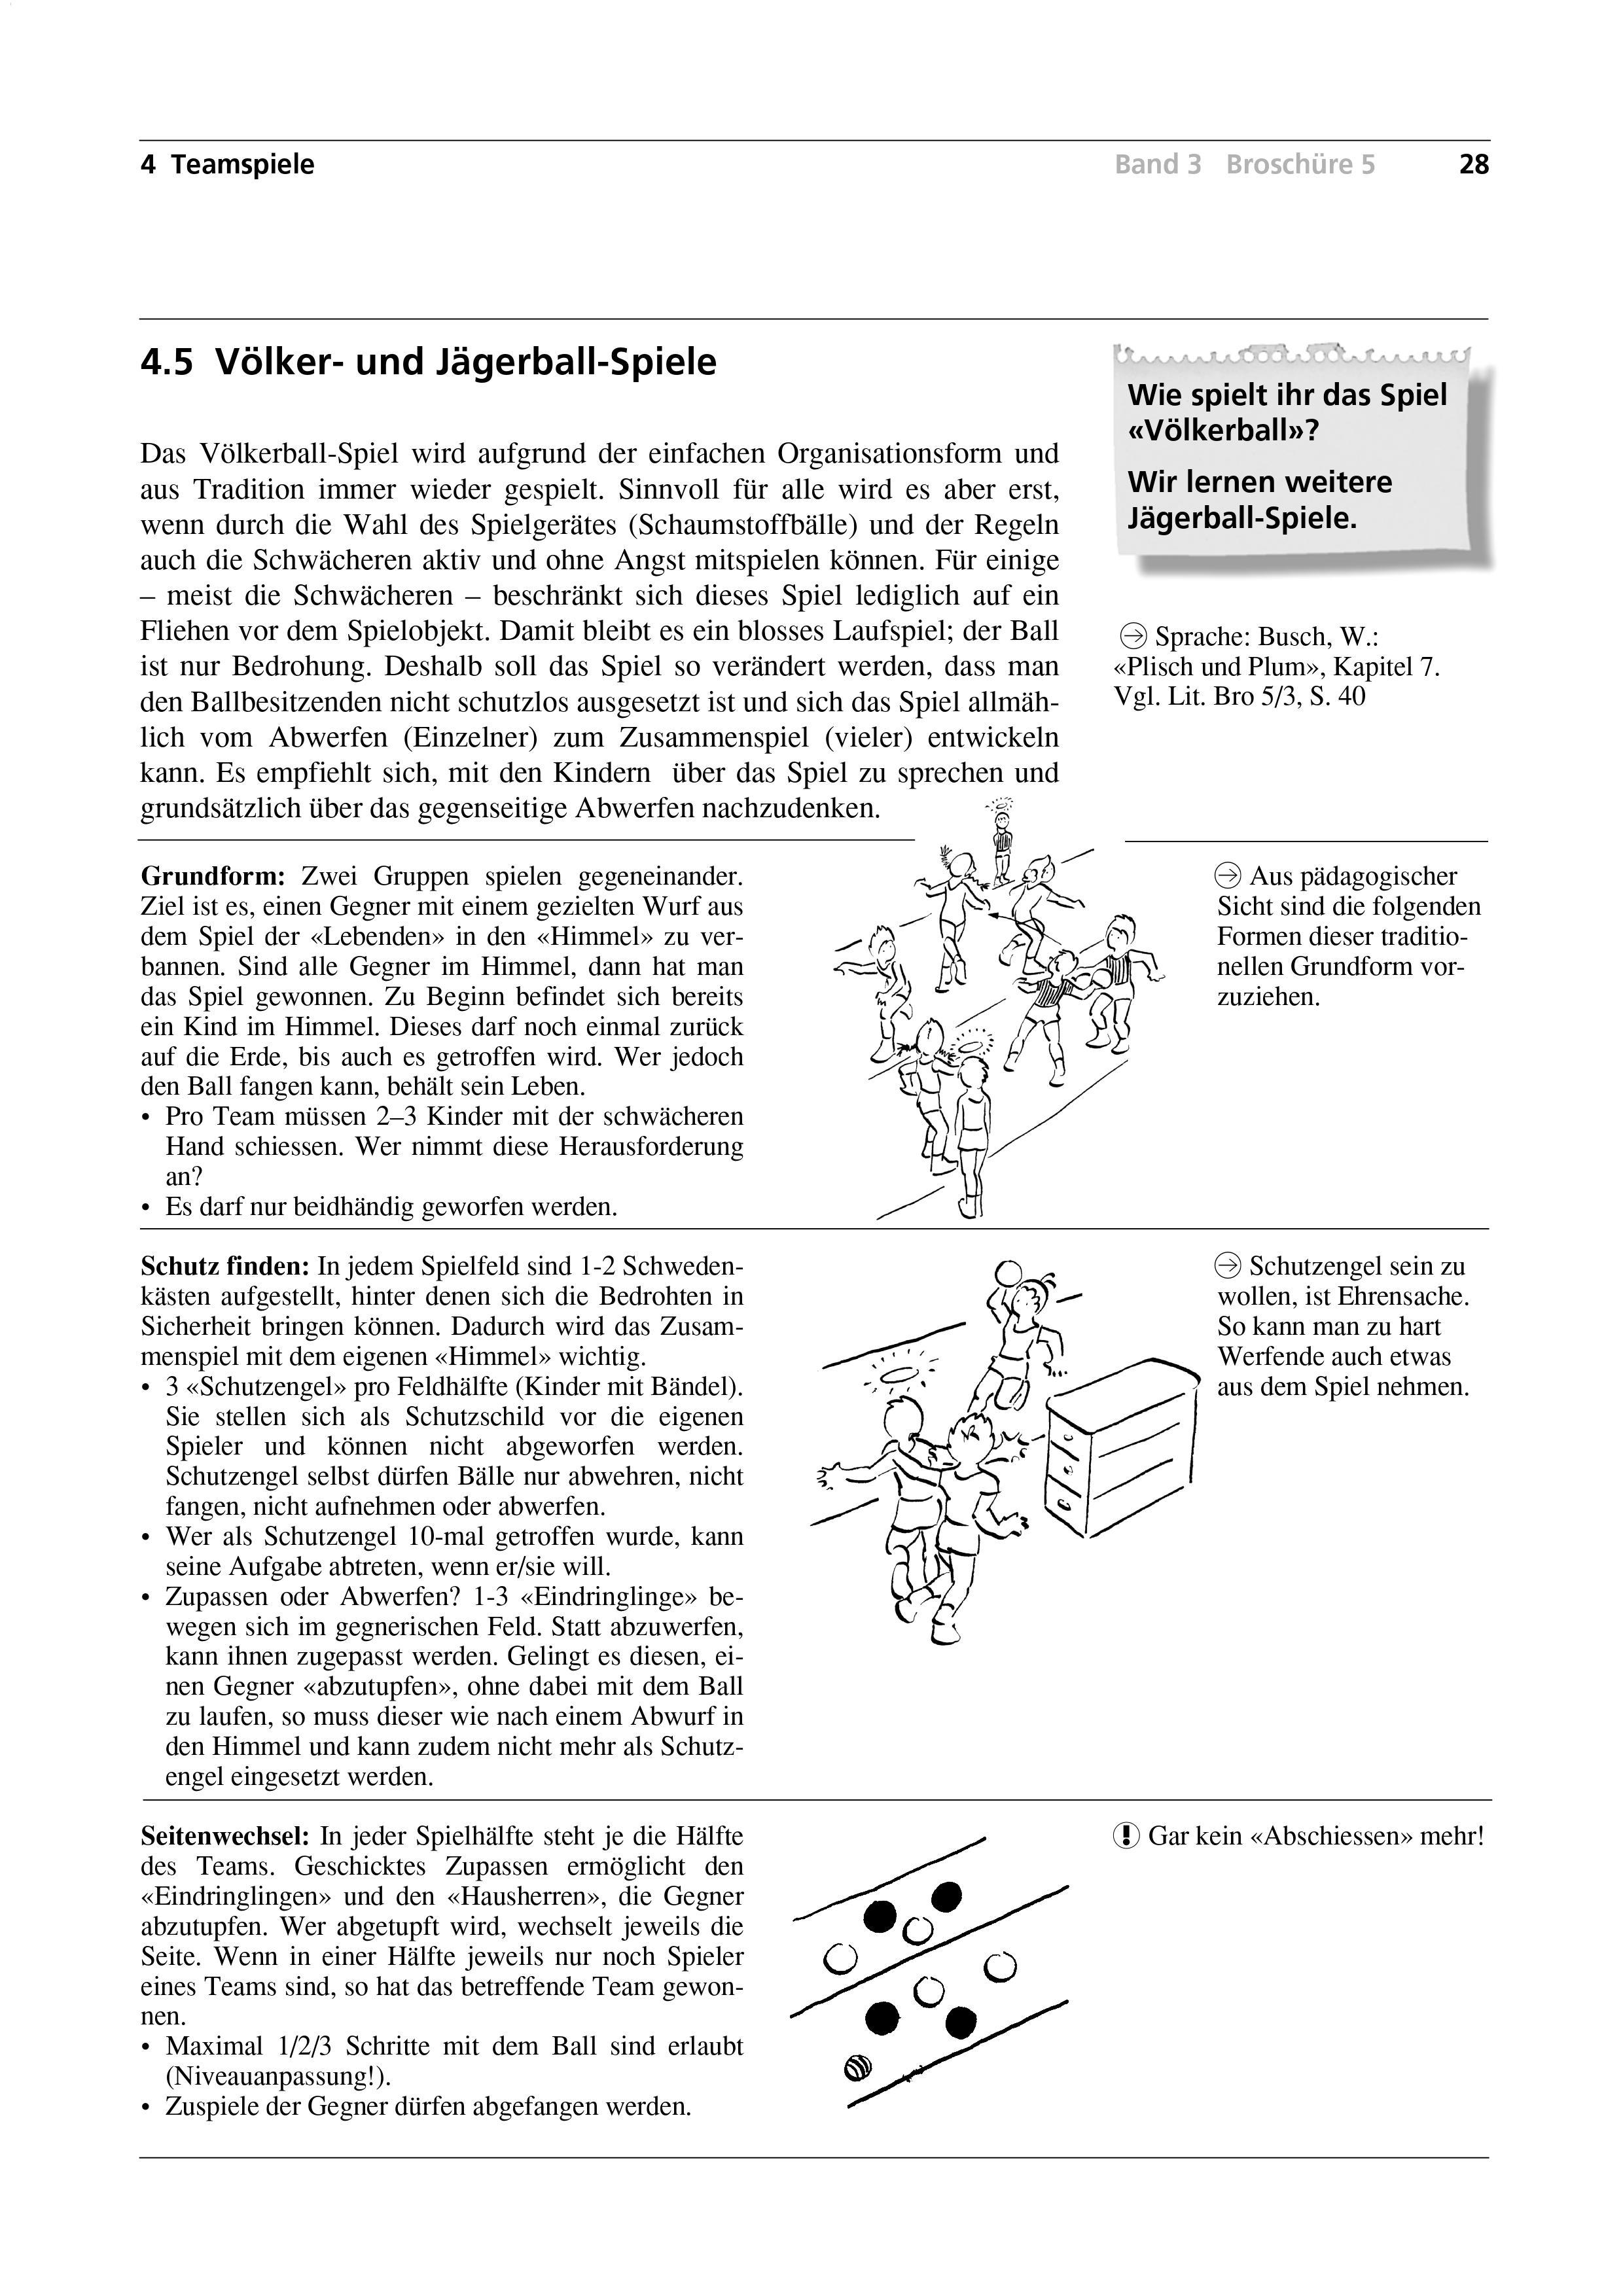 Preview image for LOM object Völker- und Jägerball-Spiele